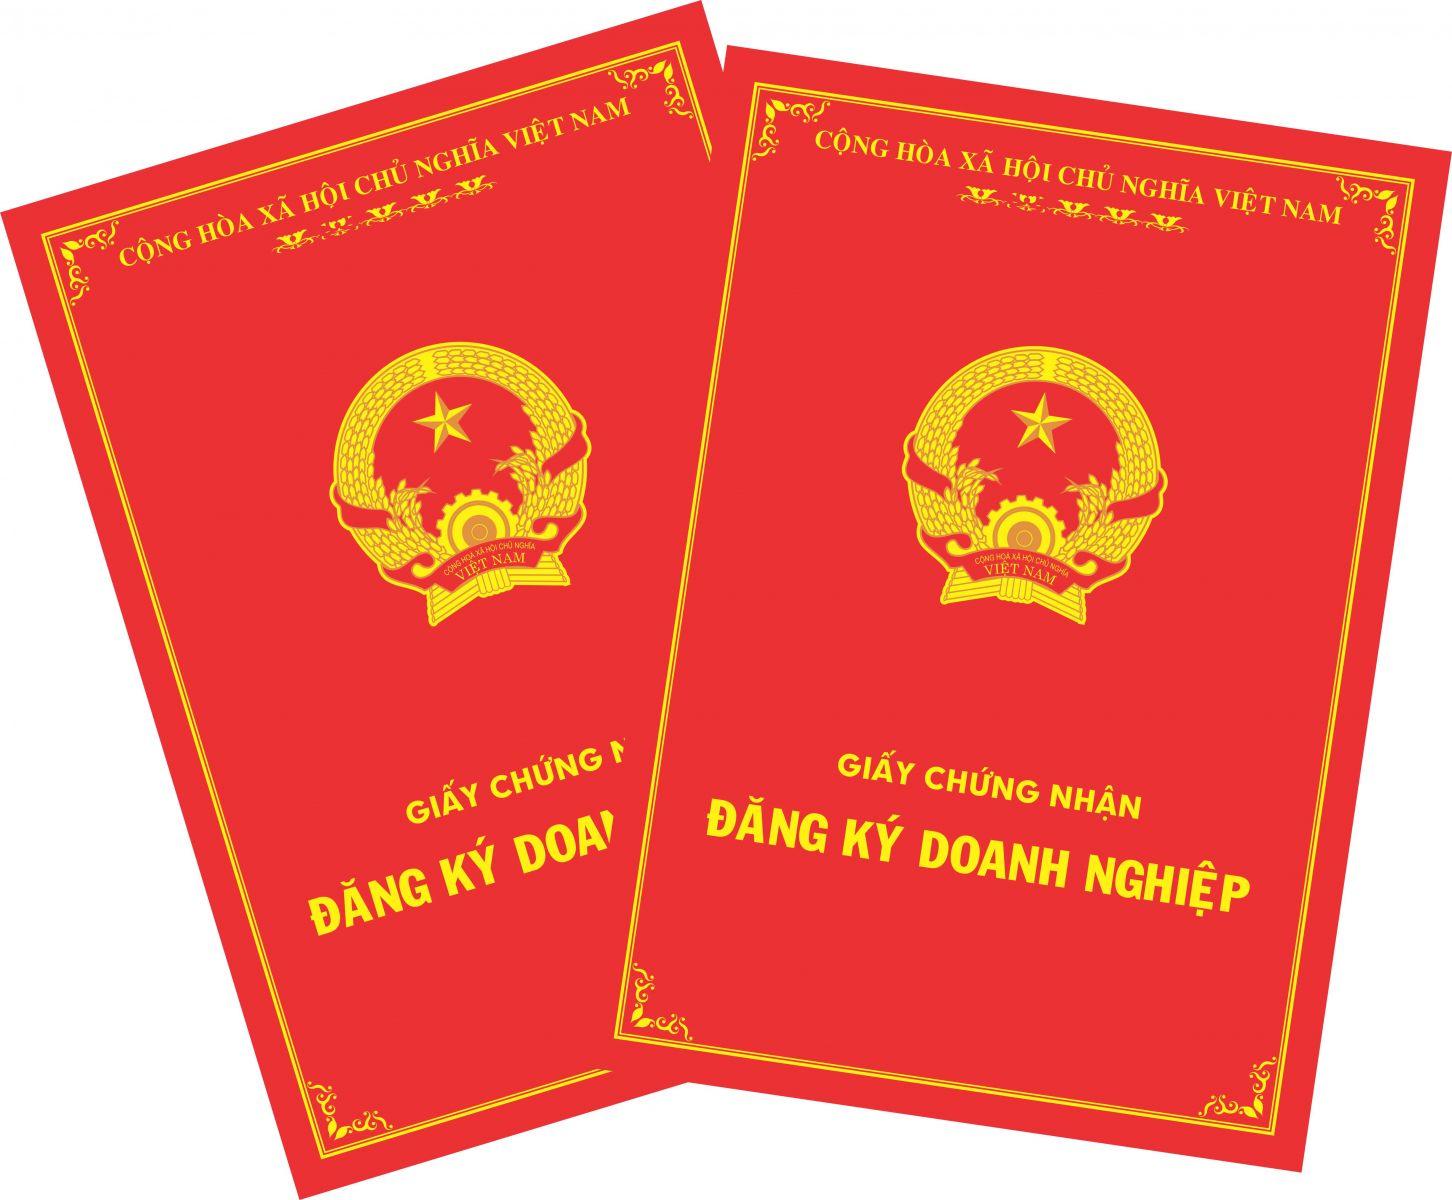 thay-doi-noi-dung-giay-chung-nhan-dang-ky-doanh-nghiep